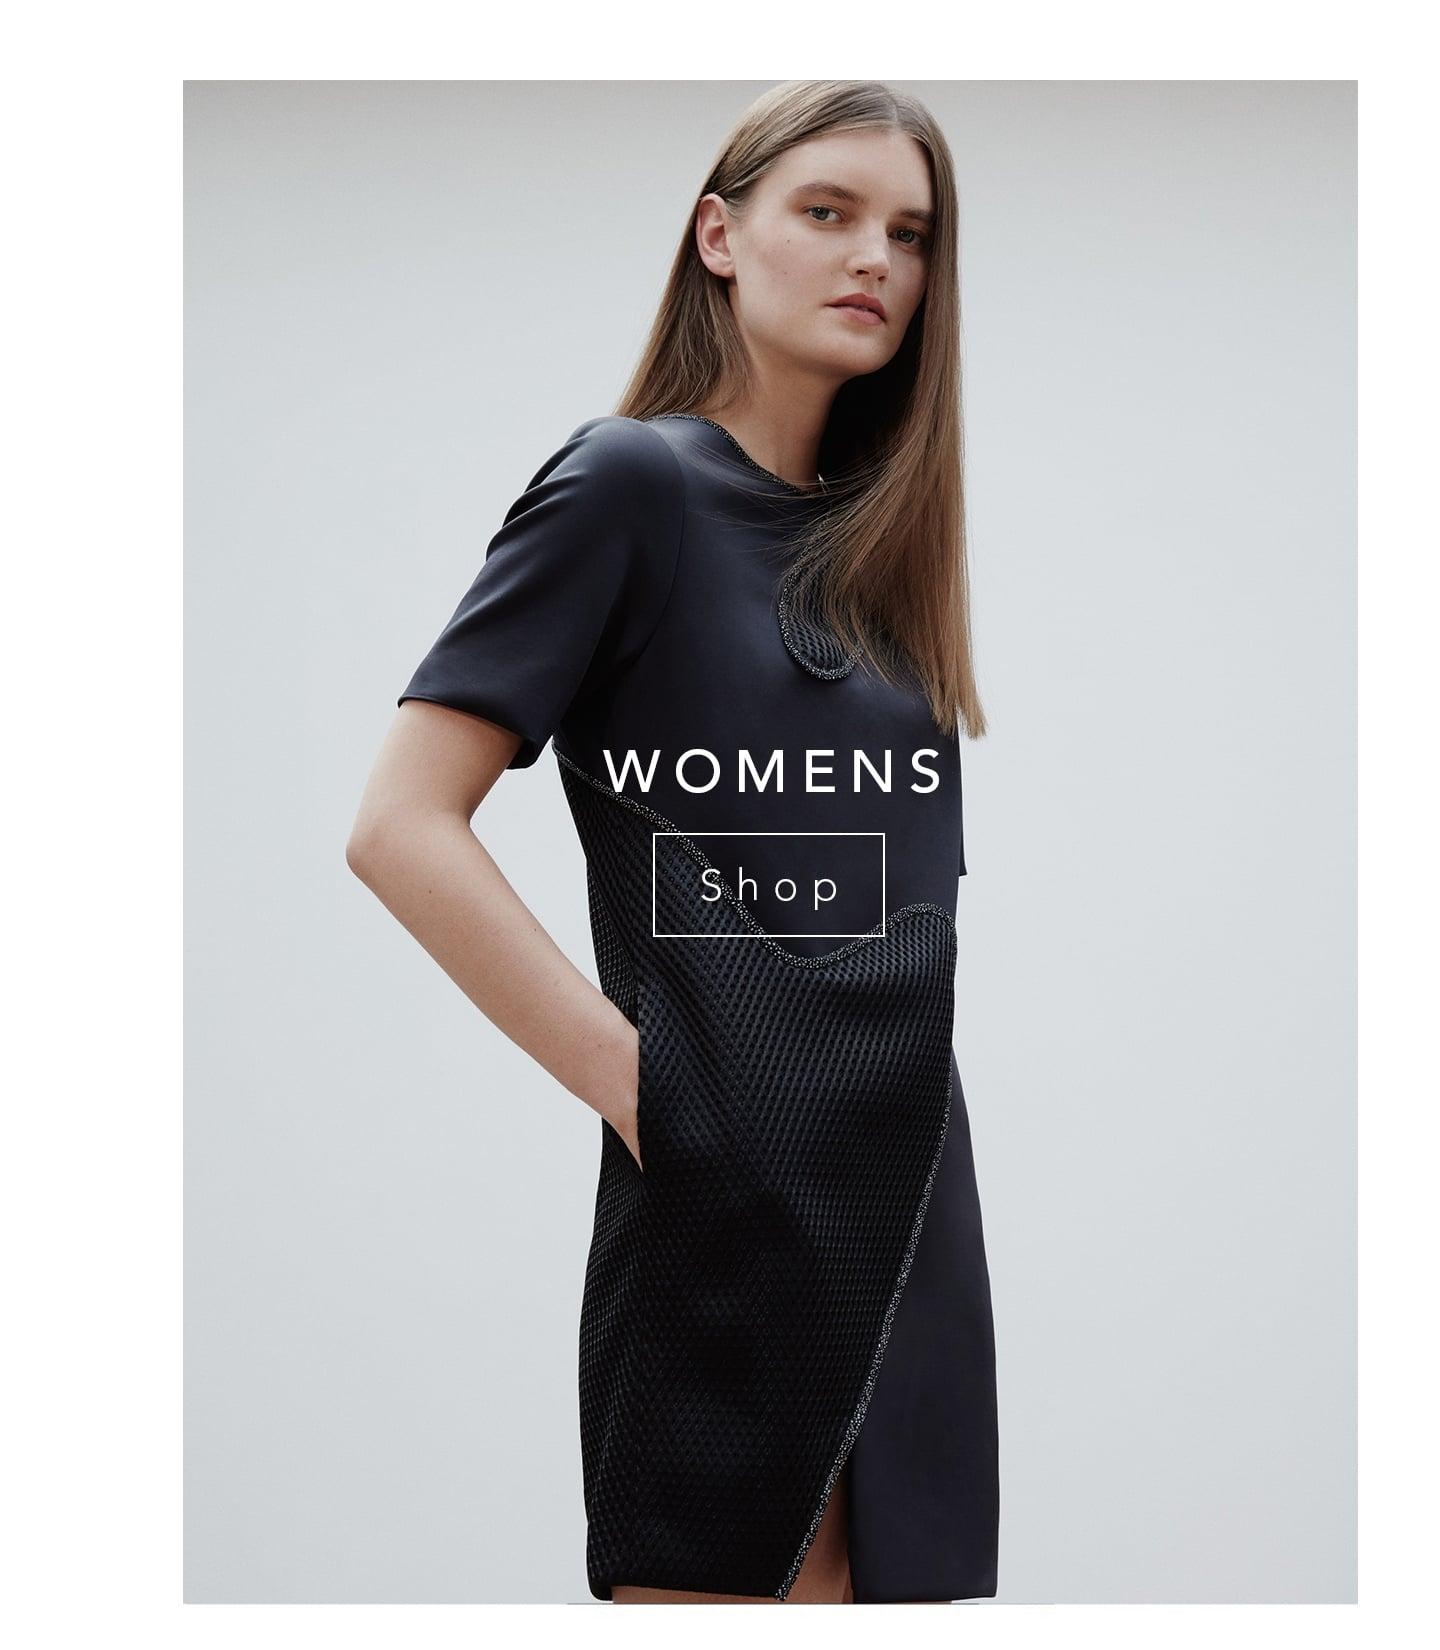 f317110a Fashion Crossover London | The Bridge To Creativity